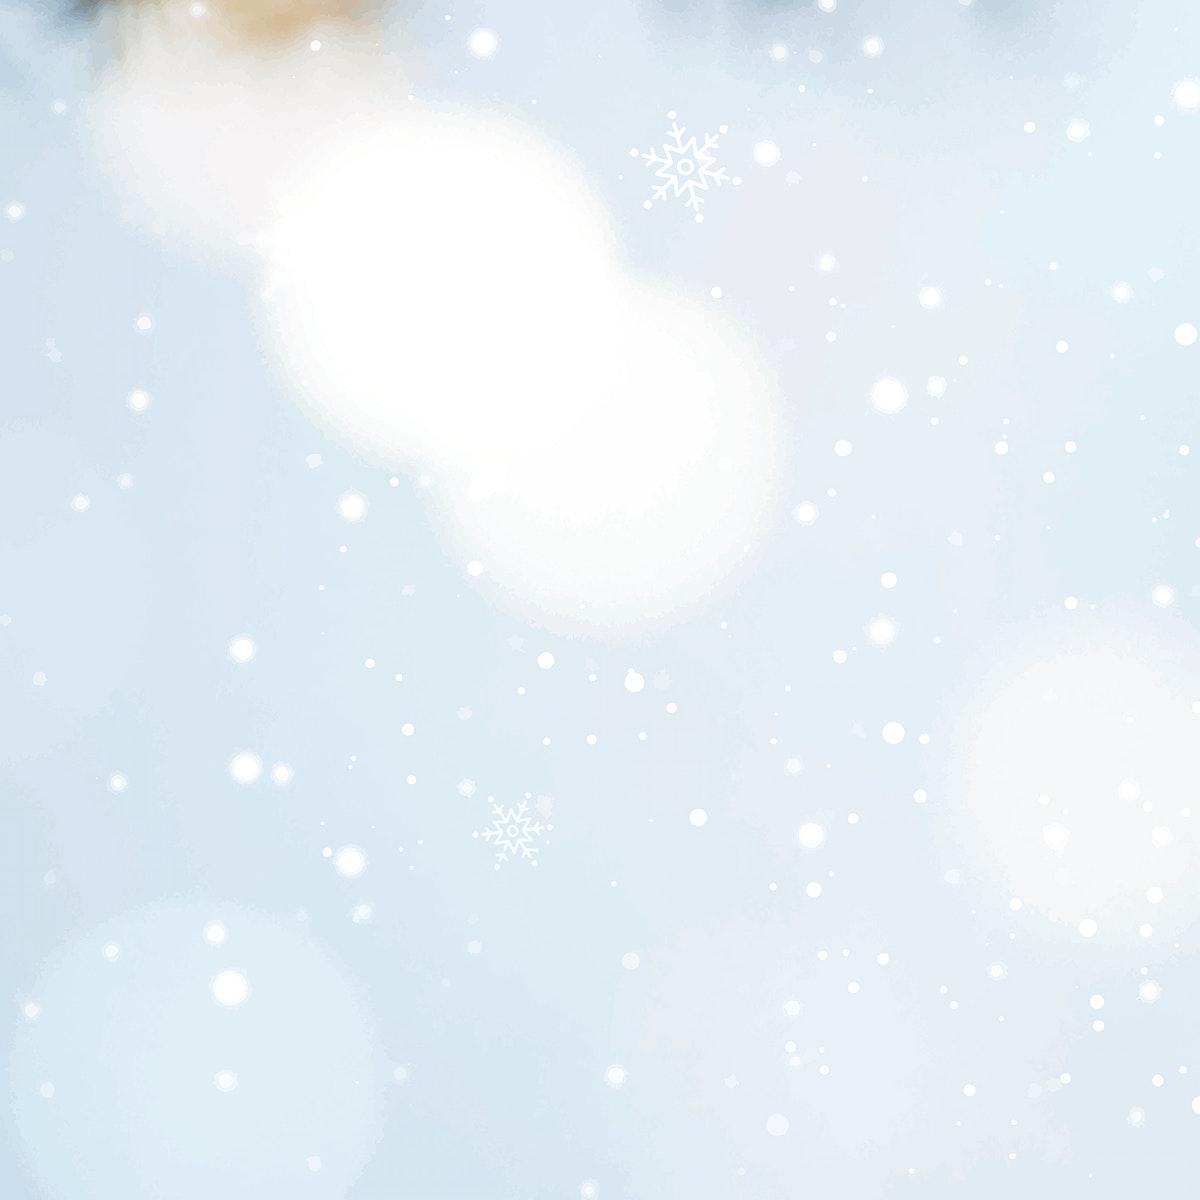 White bokeh pattern on a snowy day vector